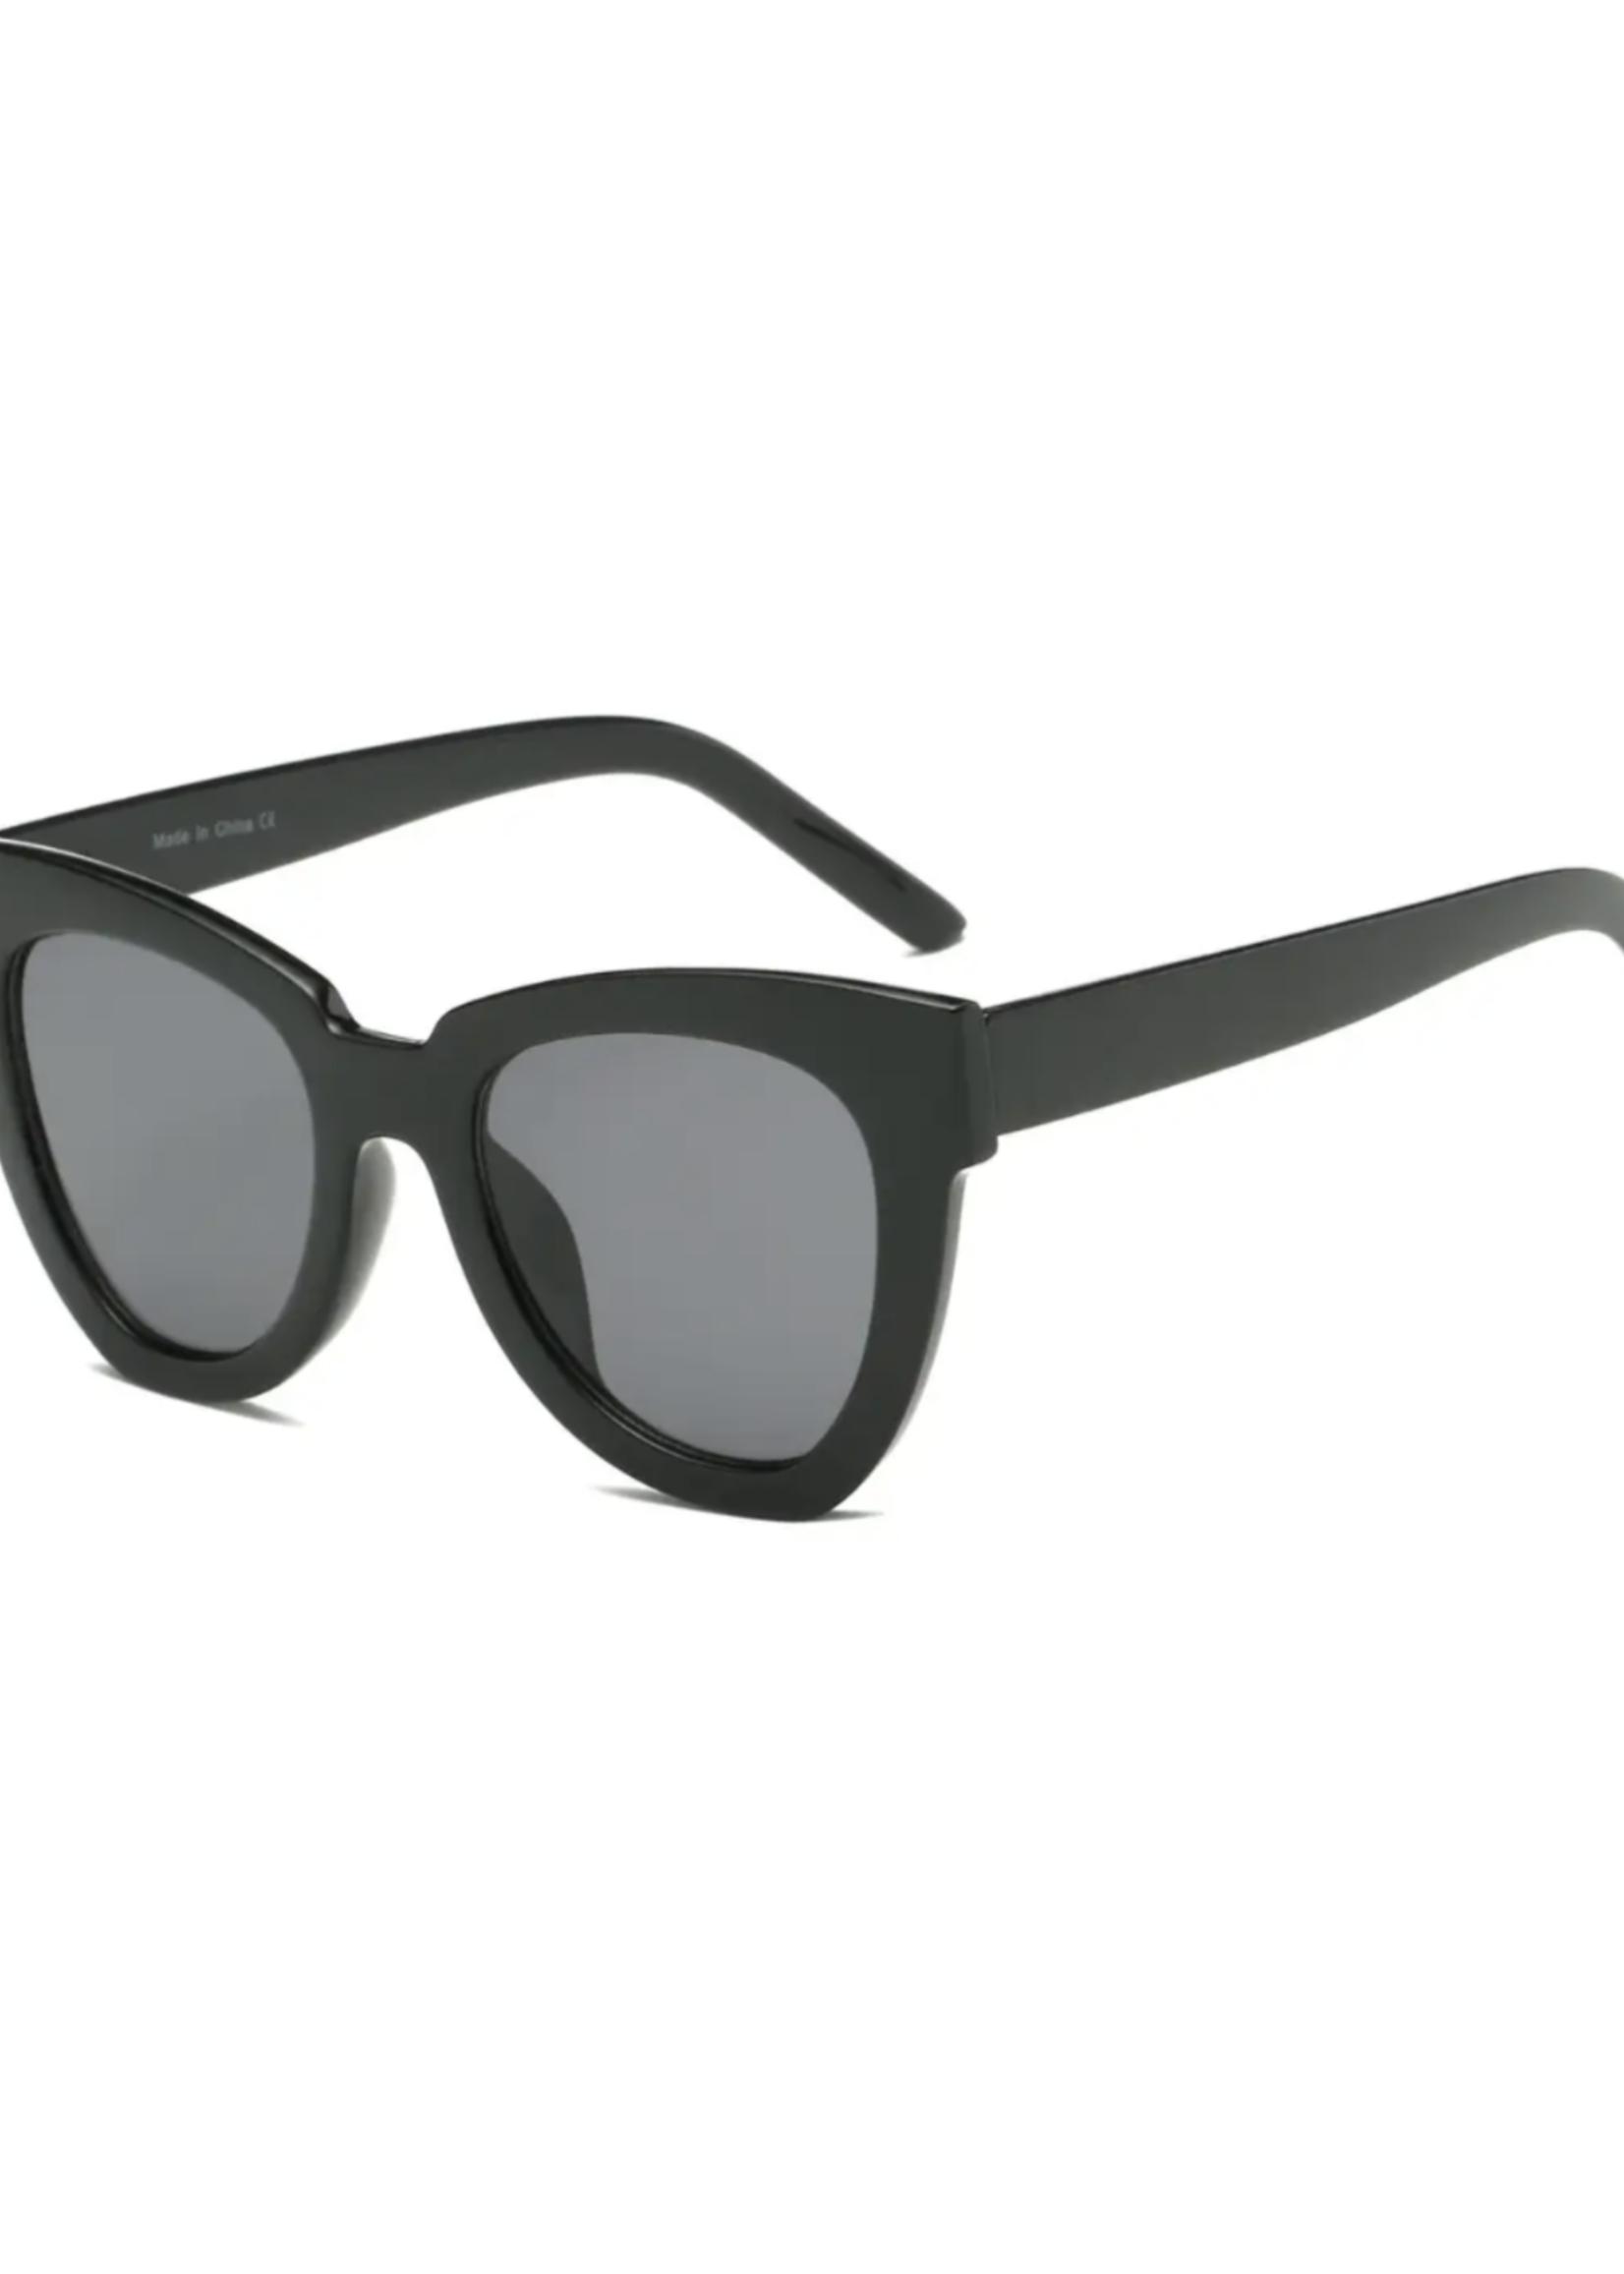 August Avenue Eyewear Nashville   Thick Framed Sunglasses